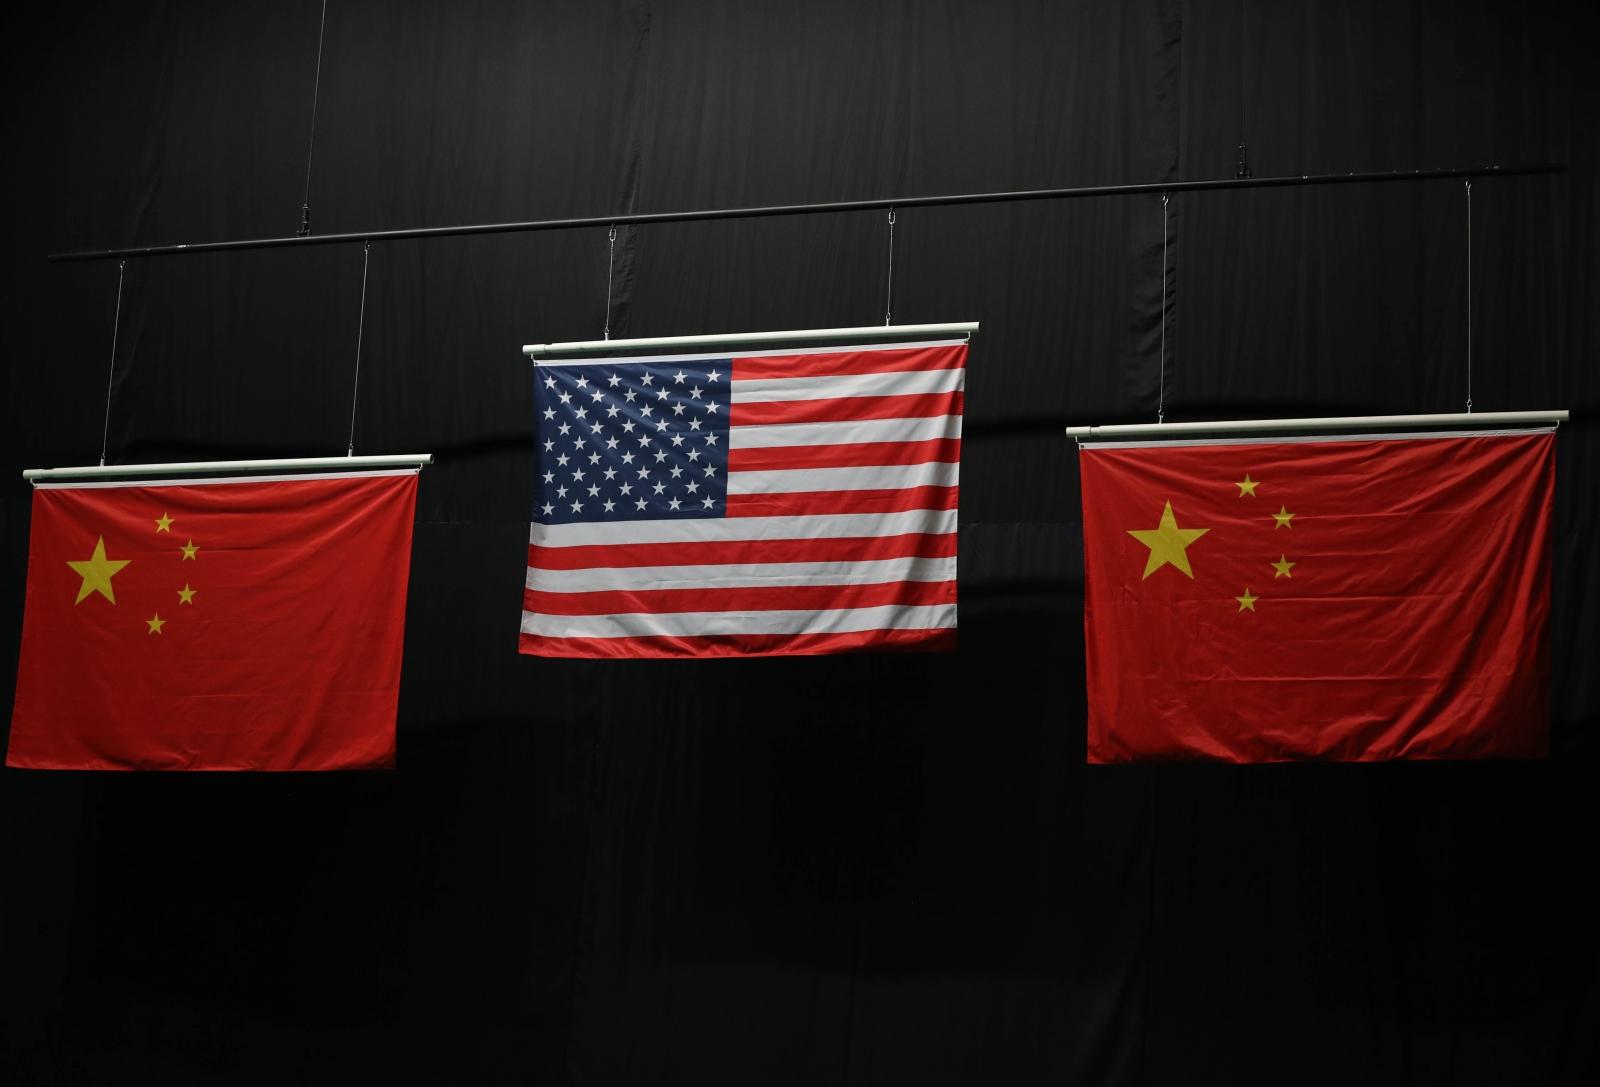 Incorrect China flag